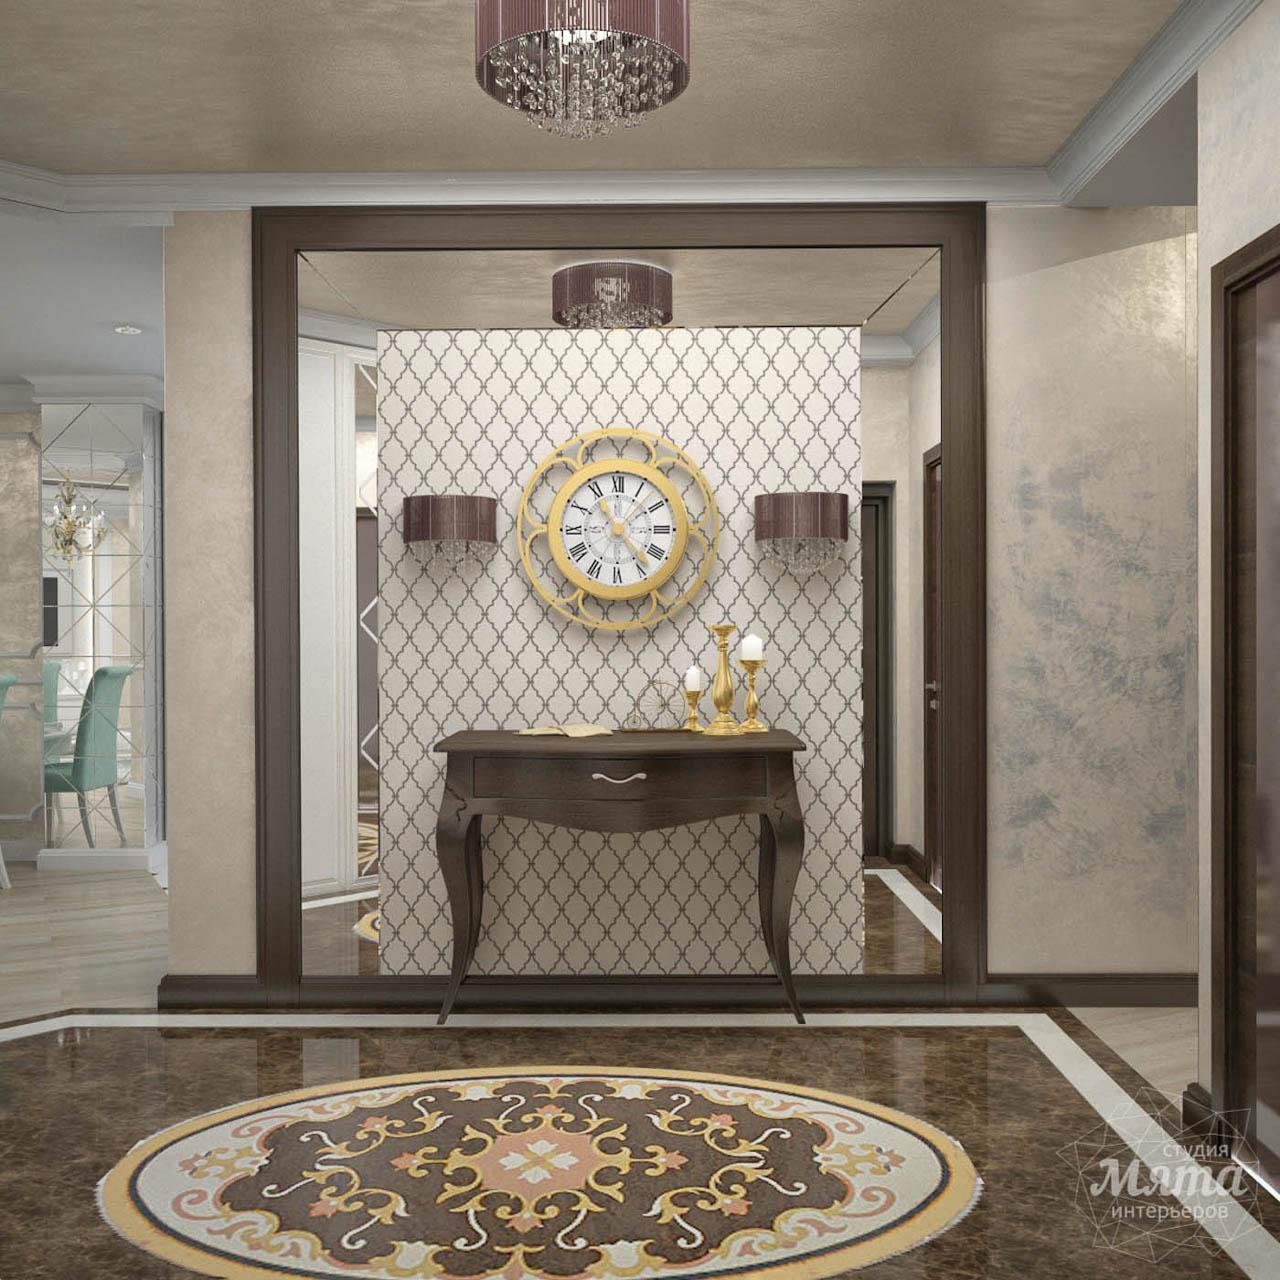 Дизайн интерьера и ремонт трехкомнатной квартиры по ул. 8 Марта 190 img436172963